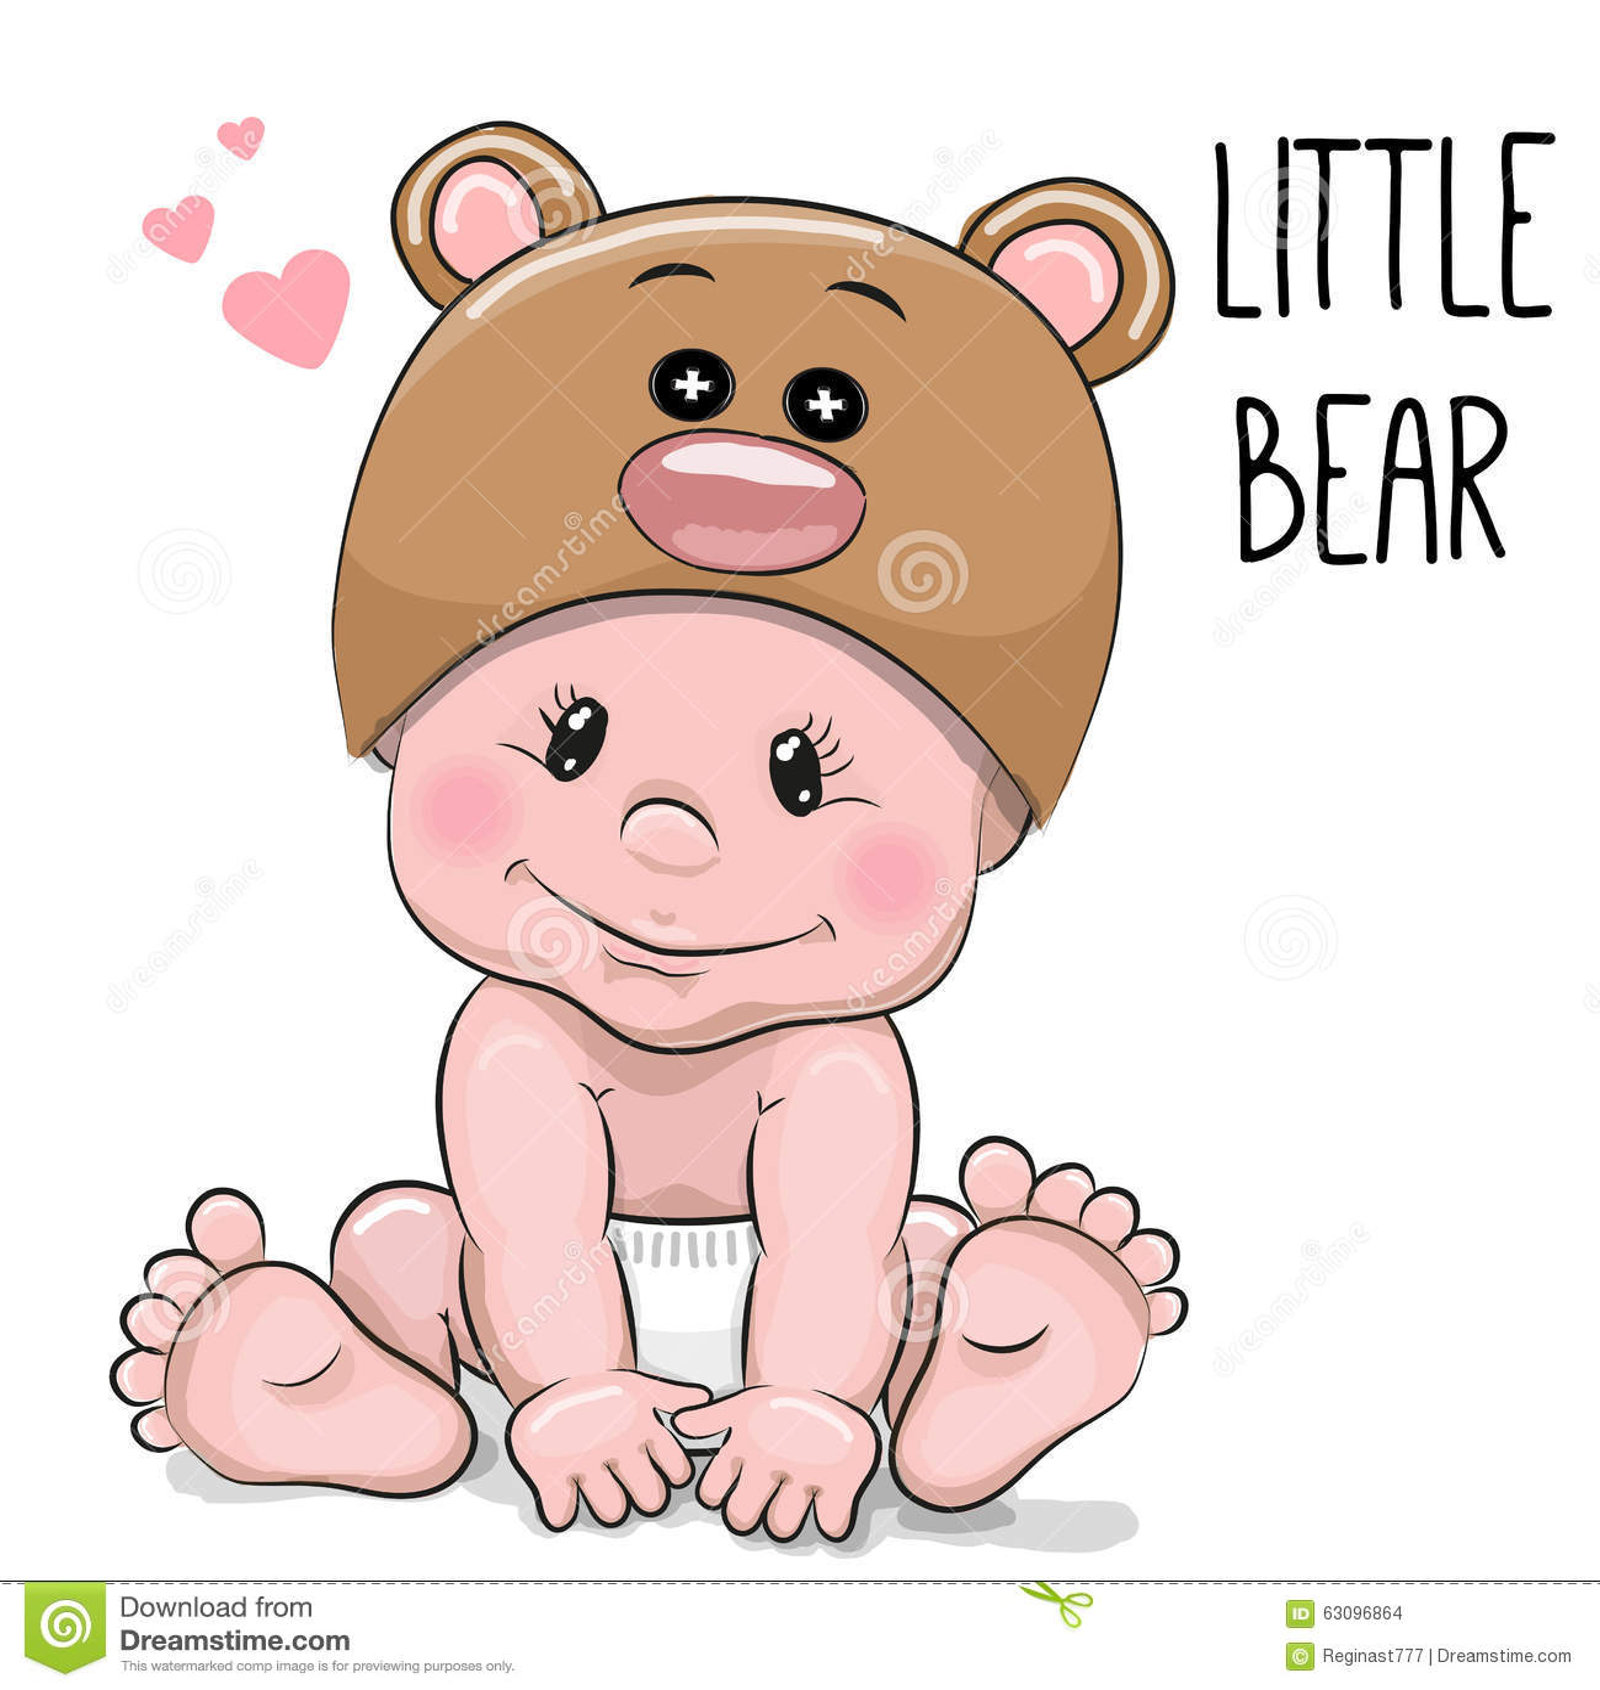 Cute Cartoon Baby boy in a Bear hat on a white background.